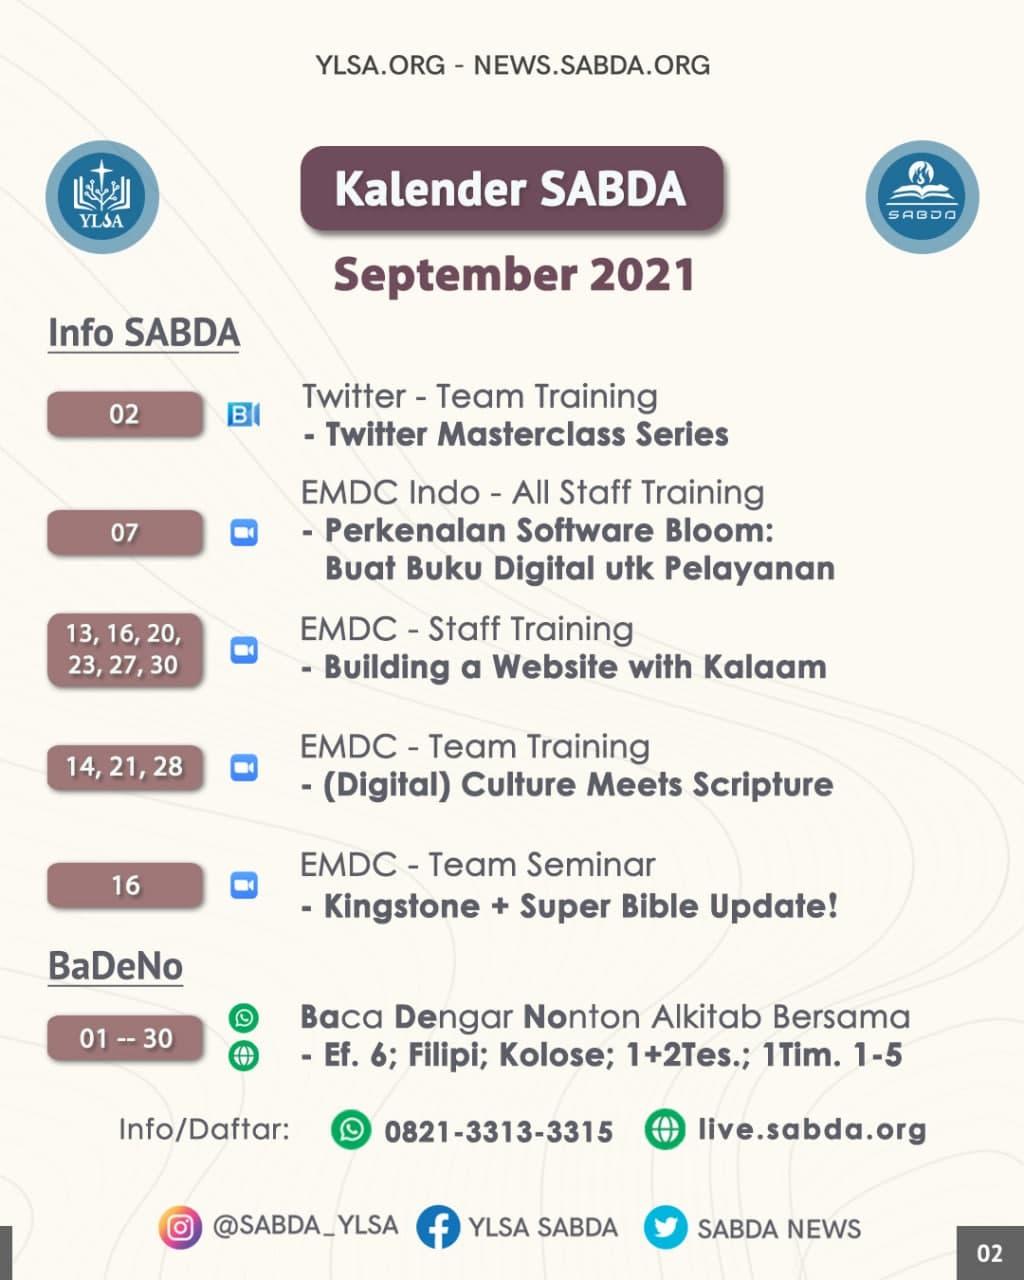 Kalender Info SABDA dan BaDeNo selama September 2021.